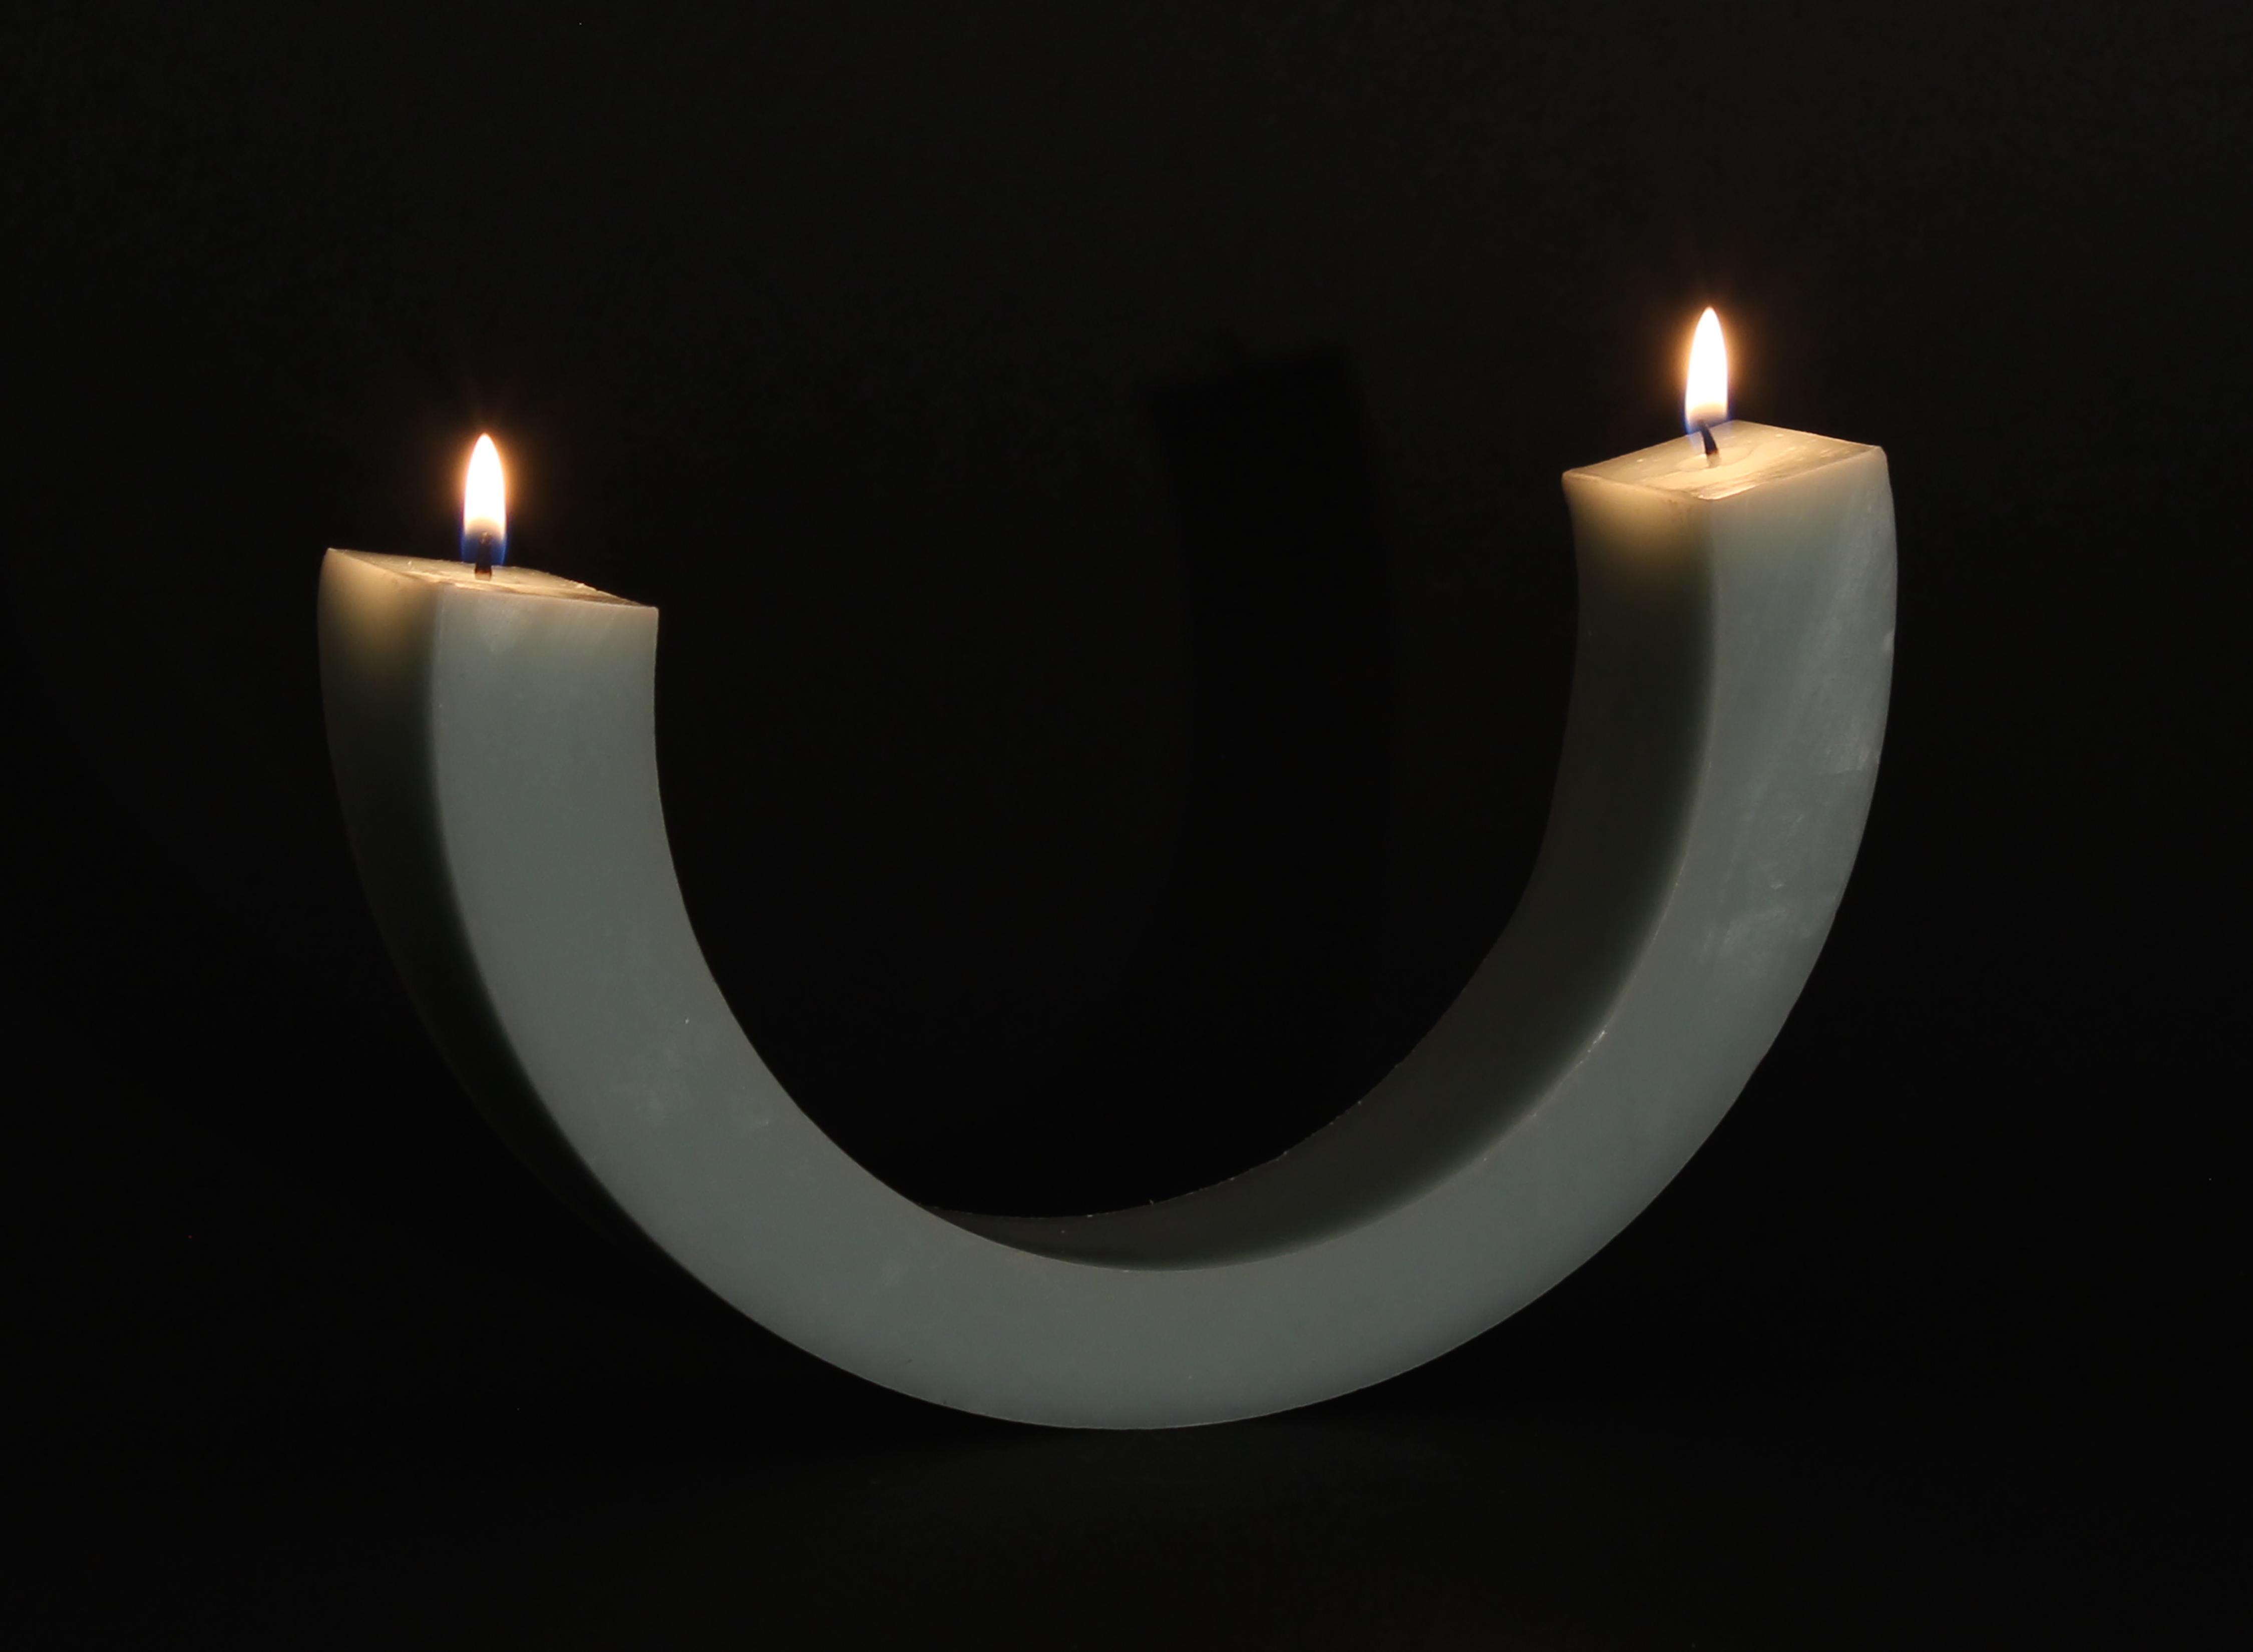 Burning - Foam Core Black